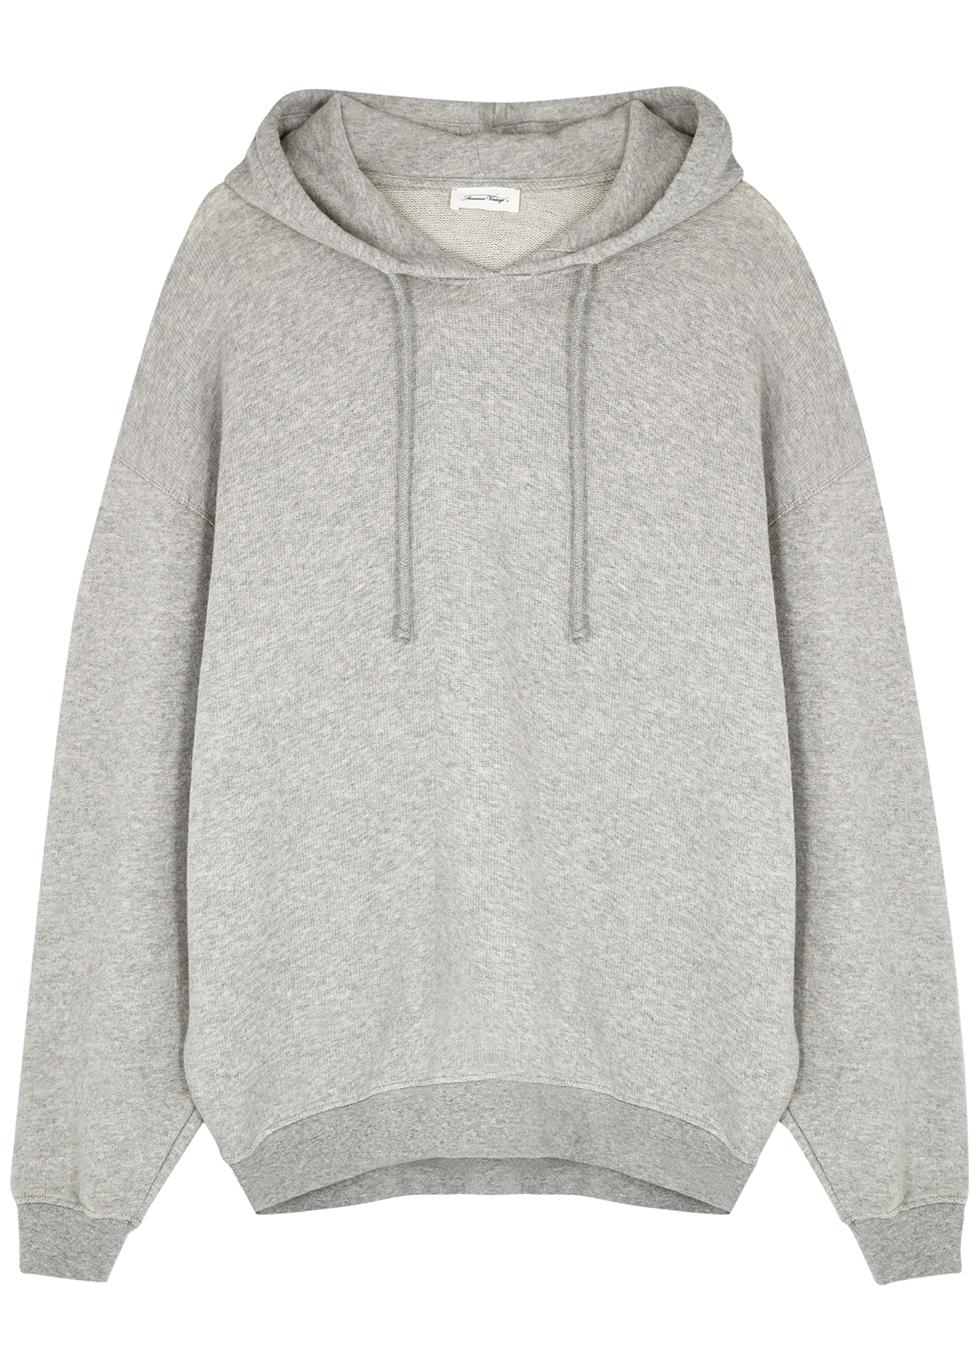 Neaford grey hooded cotton-blend sweatshirt